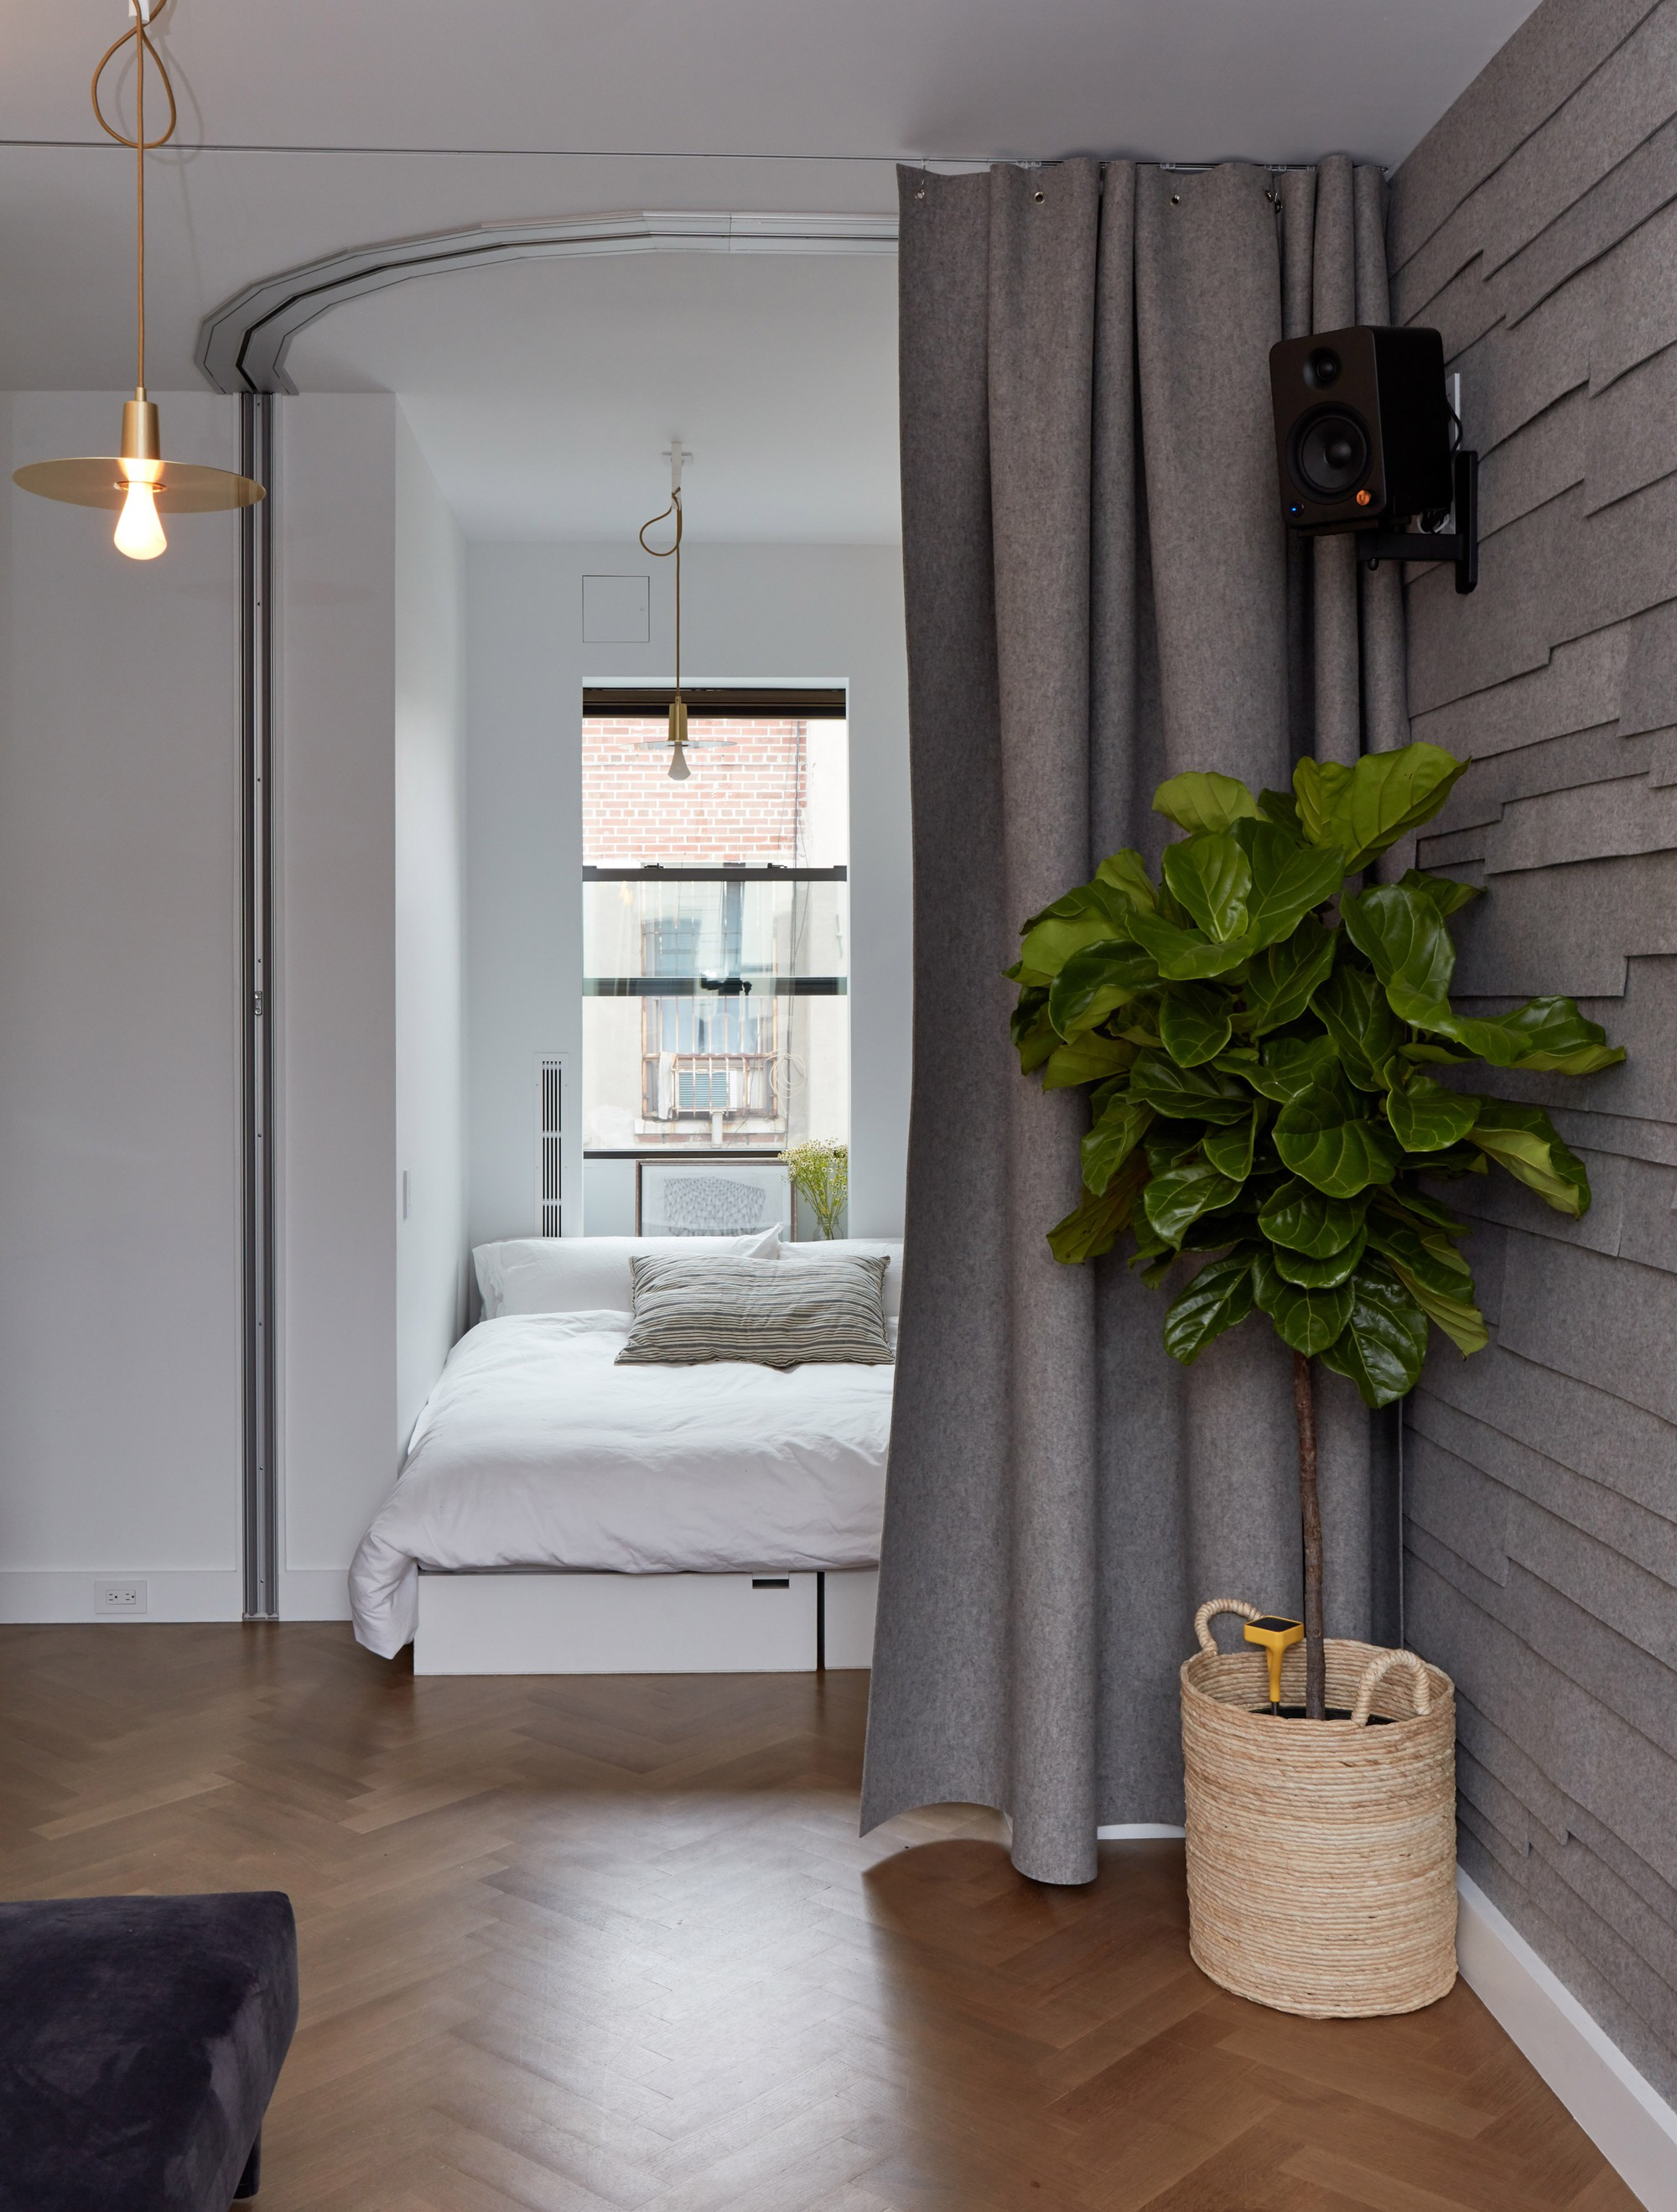 life-edited-2-graham-hill-new-york-apartment-usa_dezeen_2364_col_21